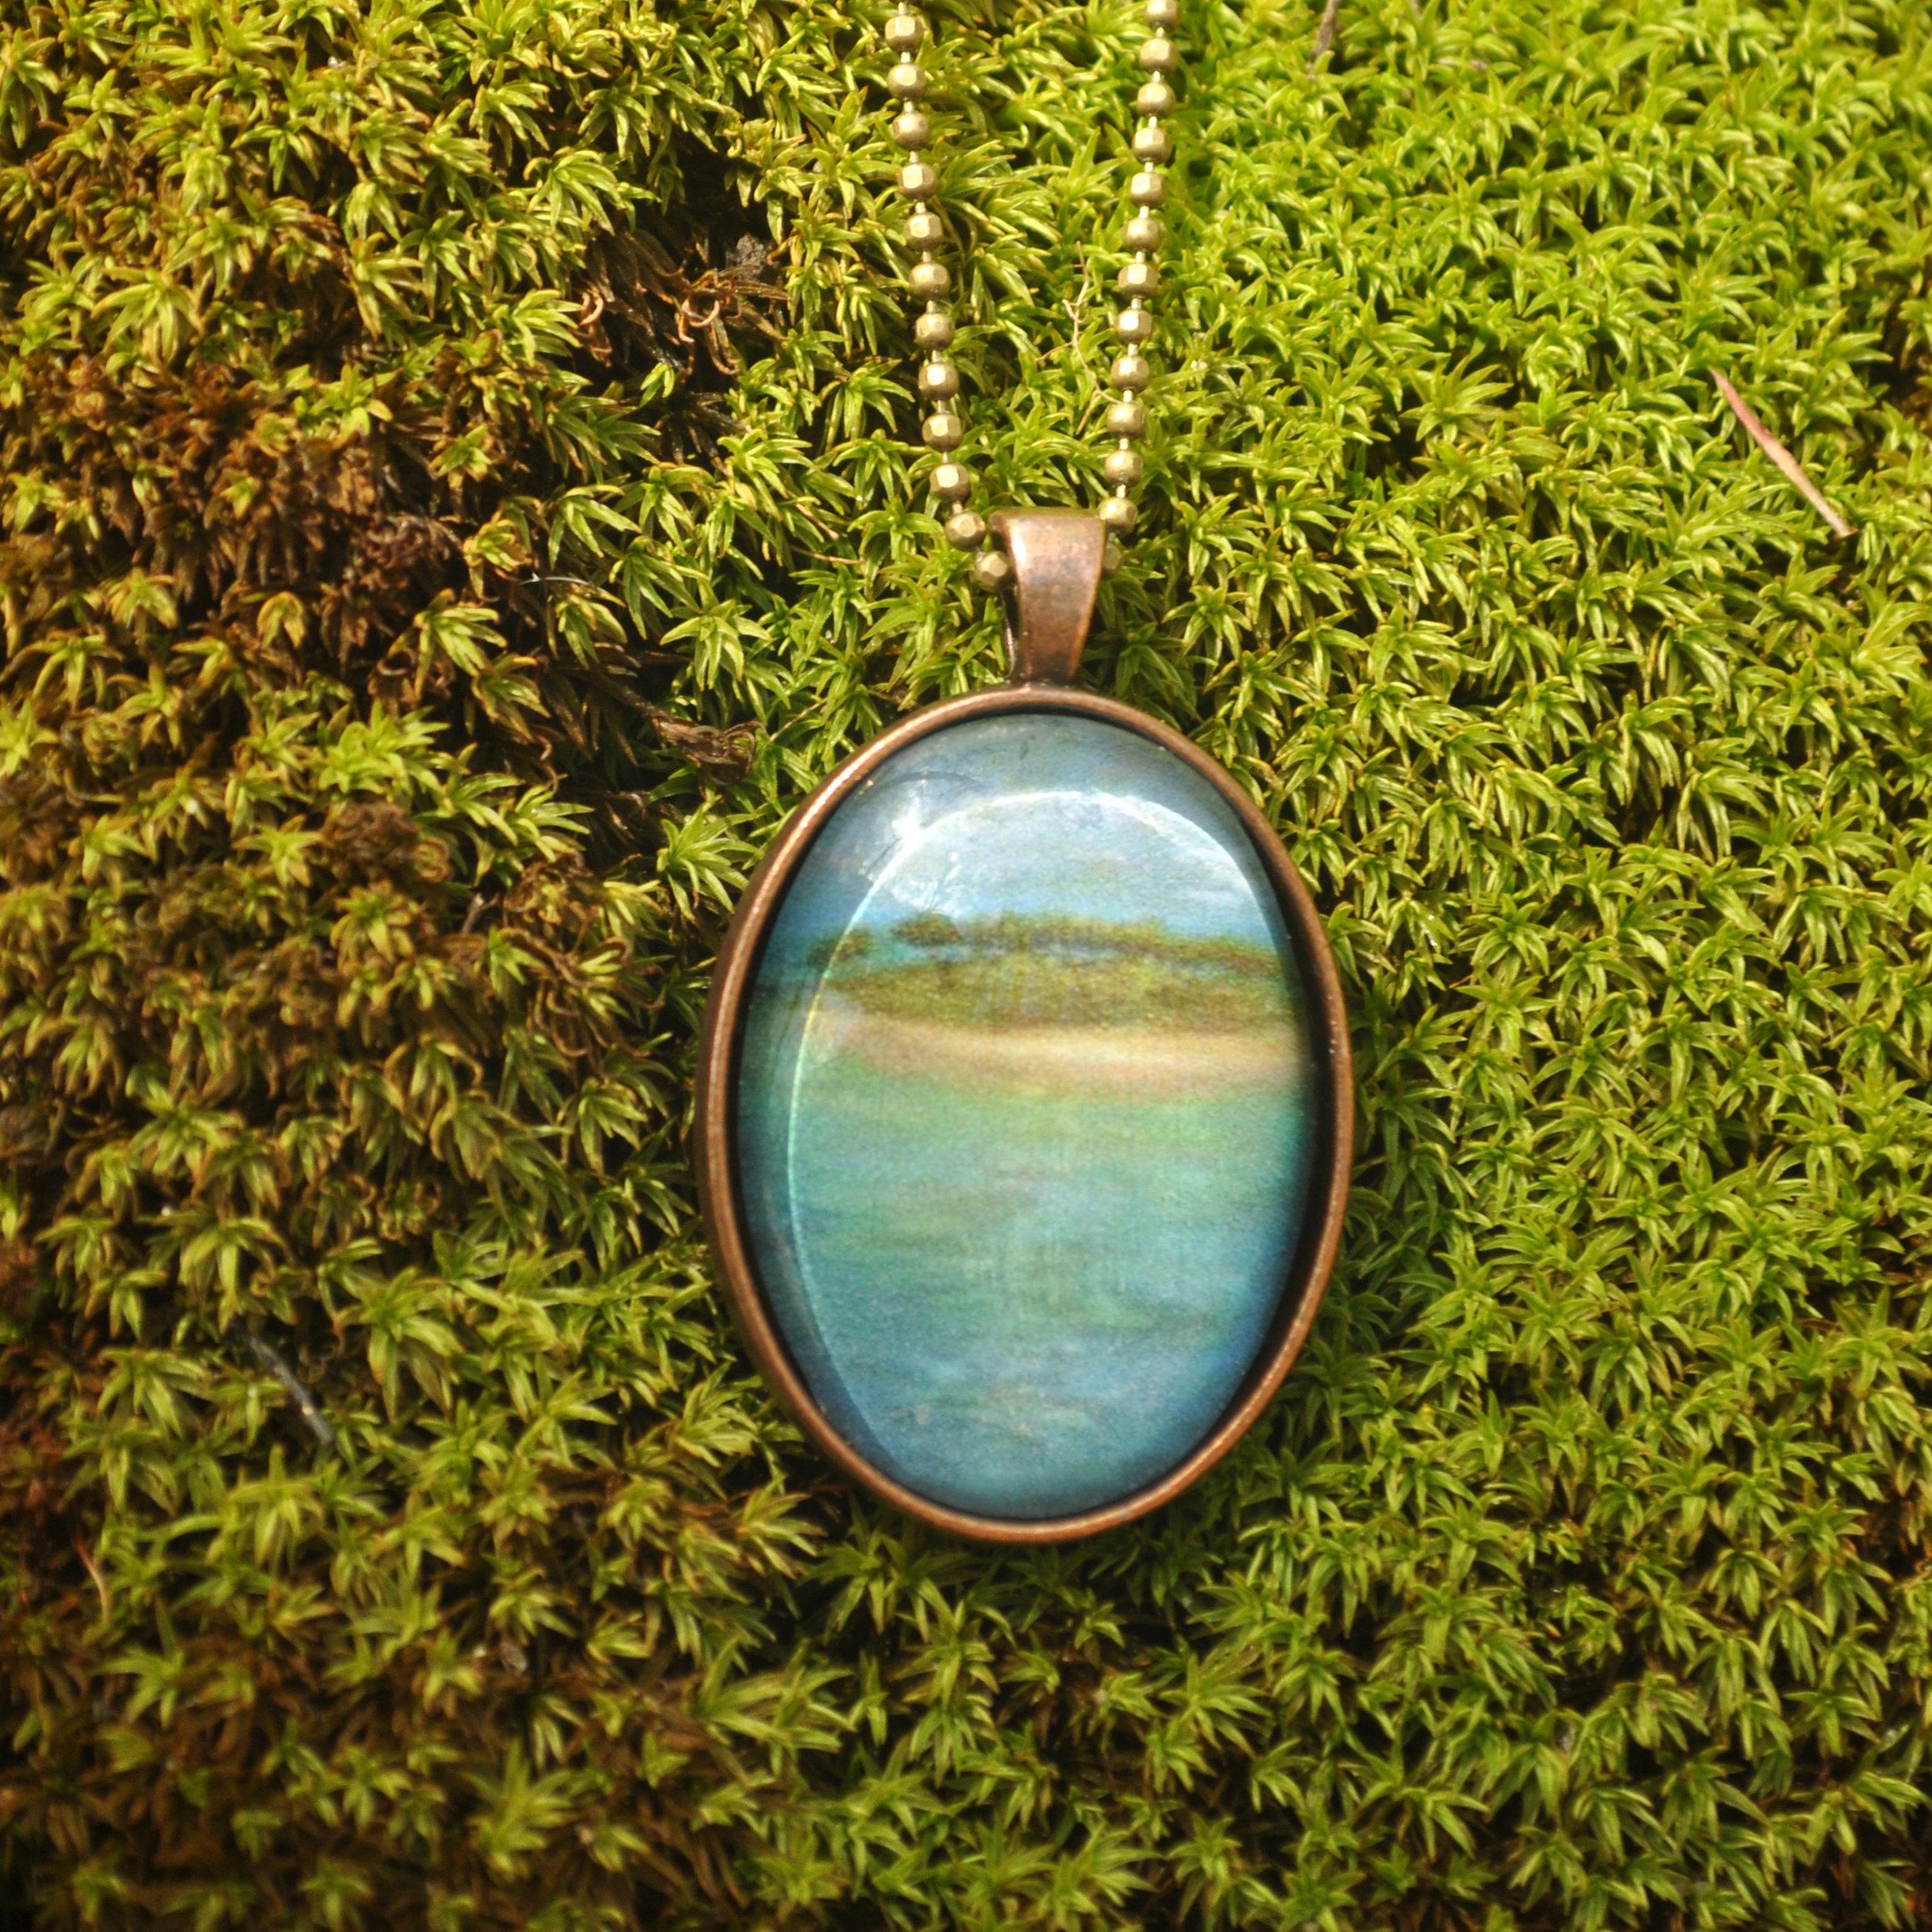 The Island by Monica Hokeilen, pendant